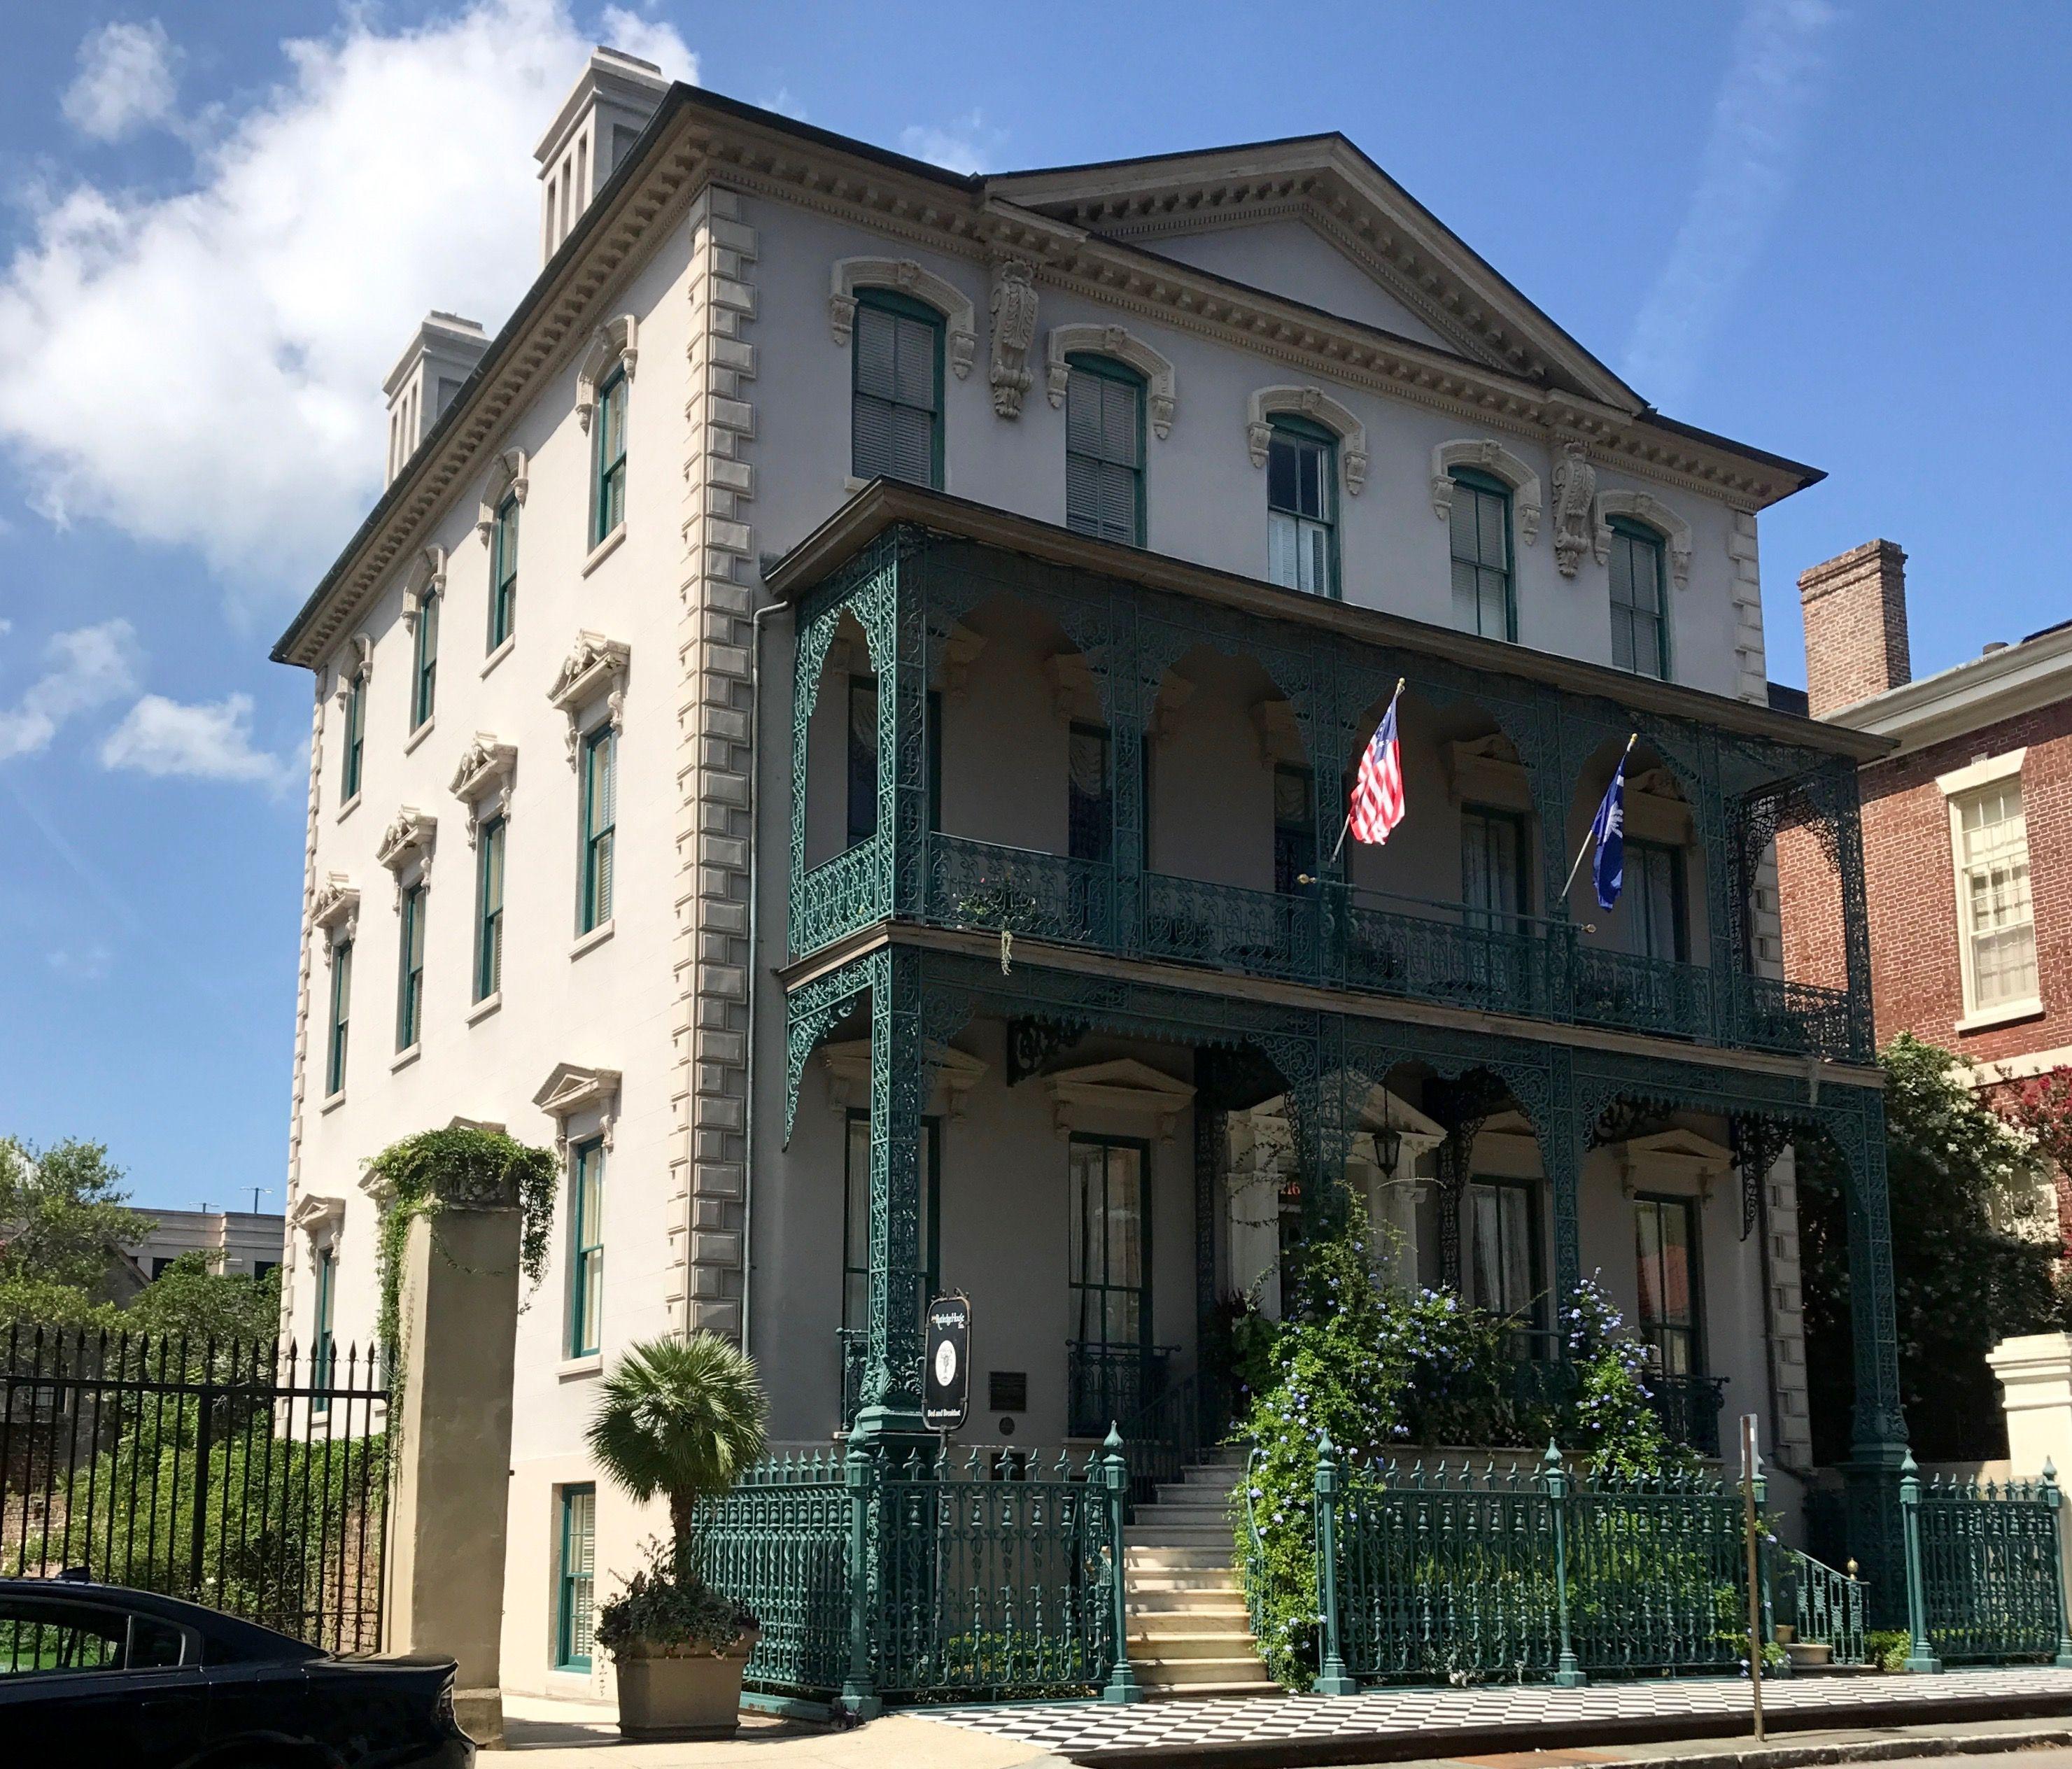 Rutledge Apartments: The John Rutledge House